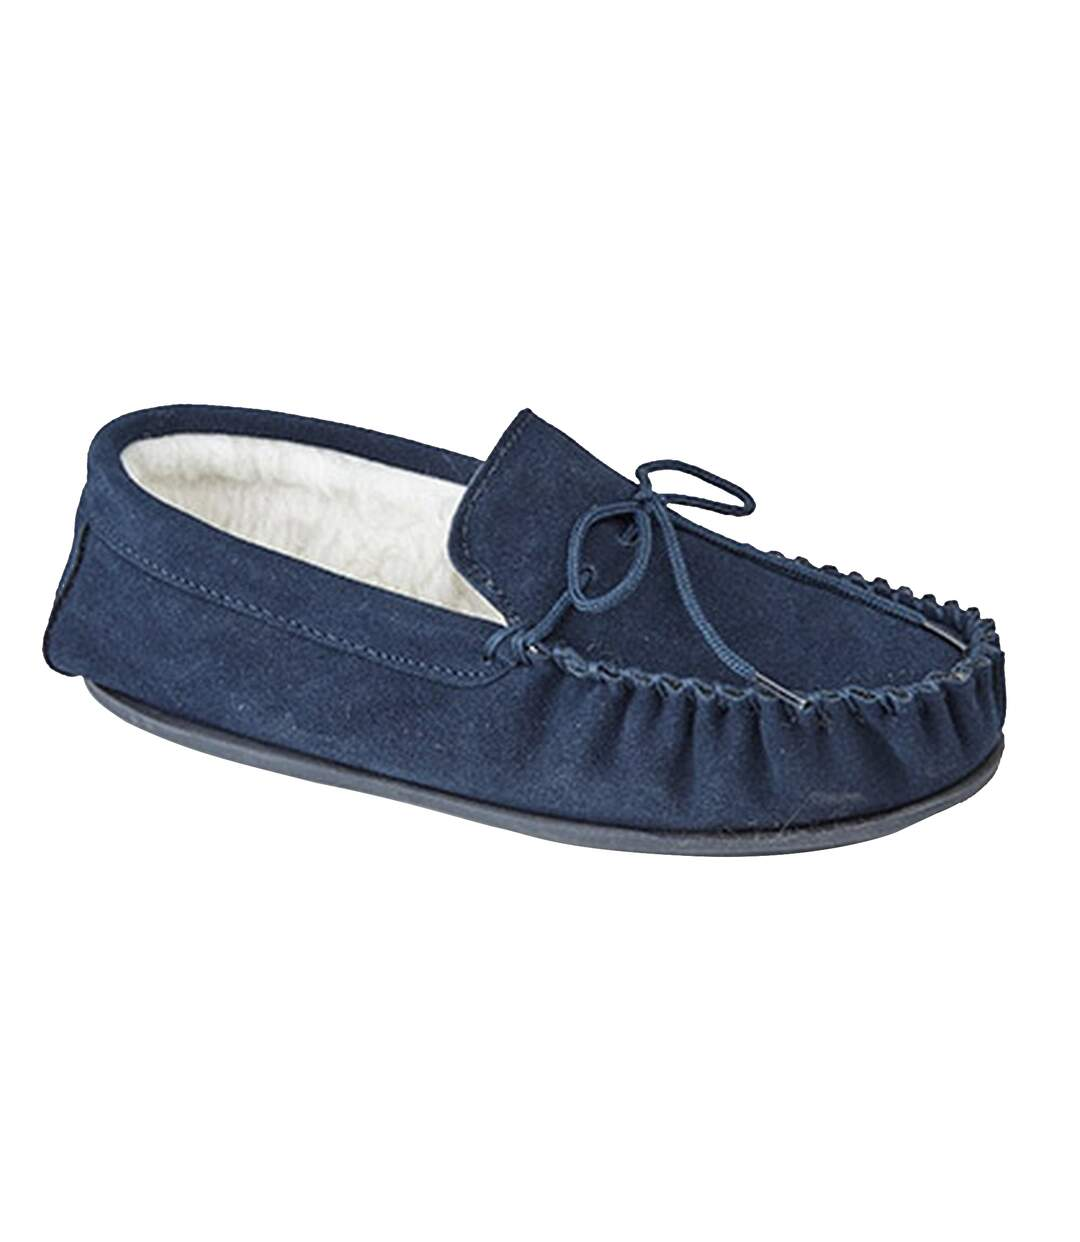 Mokkers Oliver Chaussons Style Mocassins Homme (Bleu marine) UTDF1117